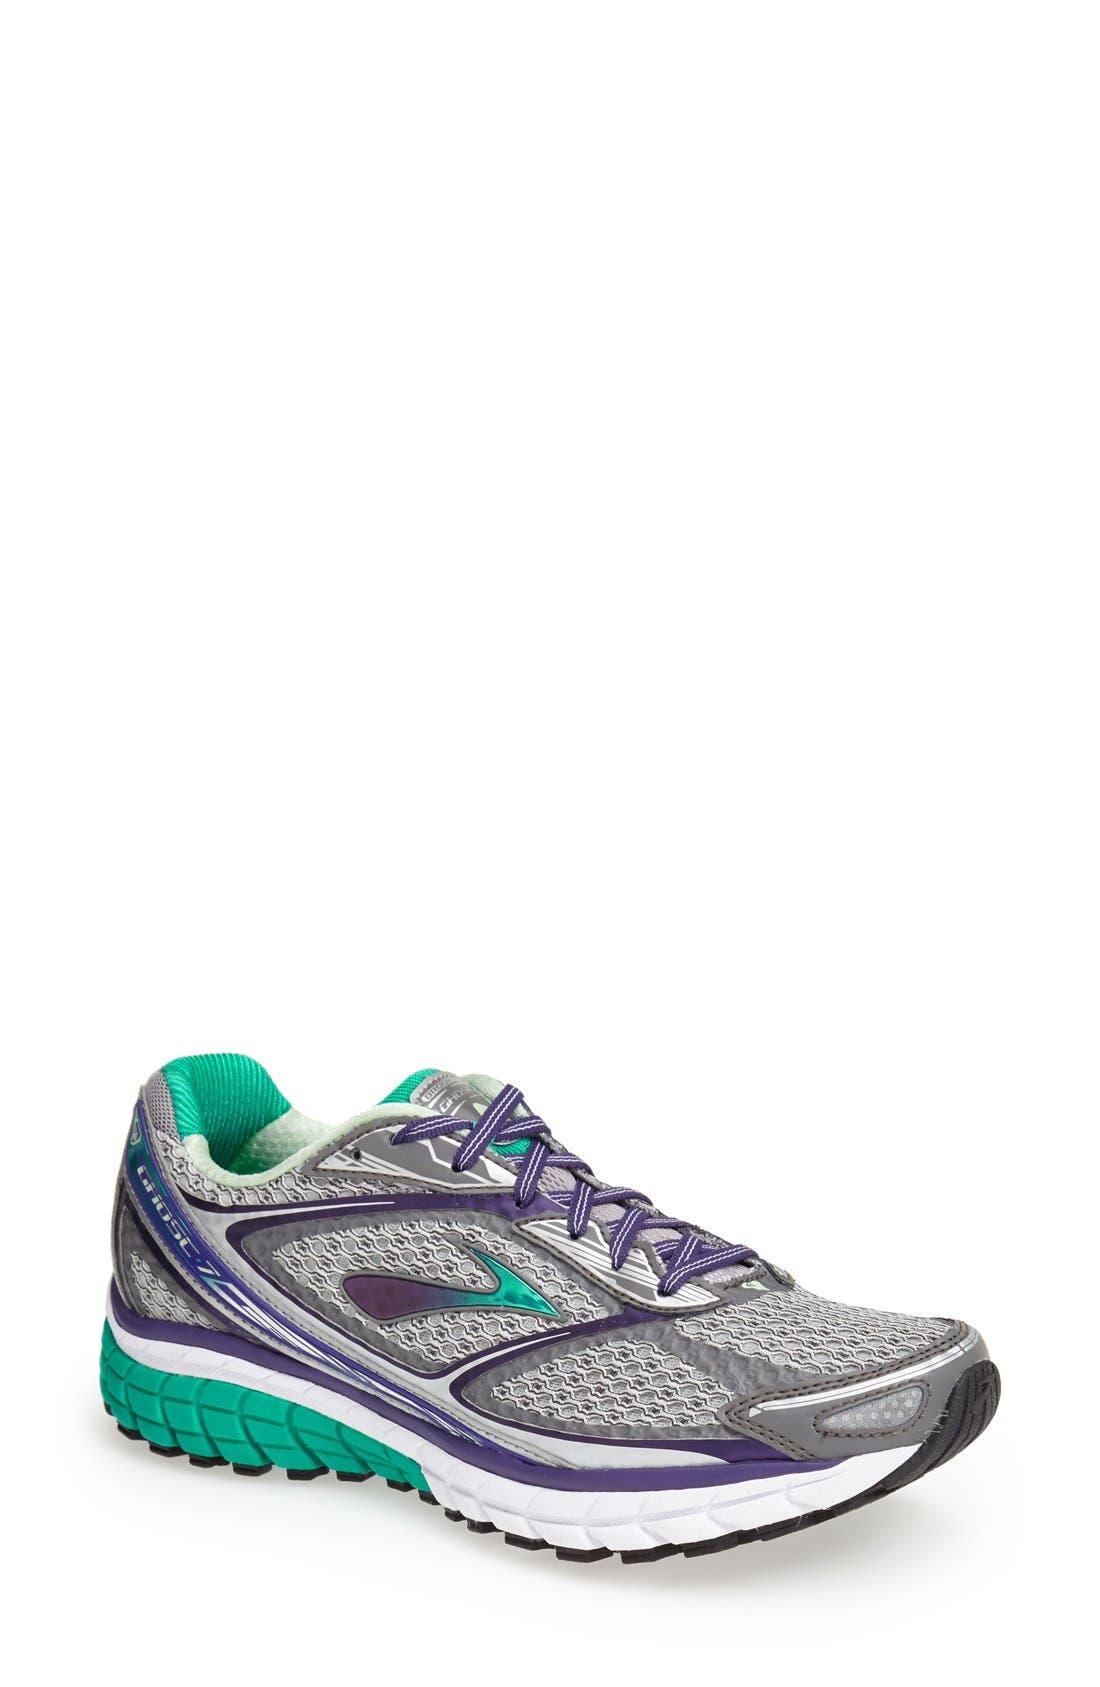 Alternate Image 1 Selected - Brooks 'Ghost 7' Running Shoe (Women)